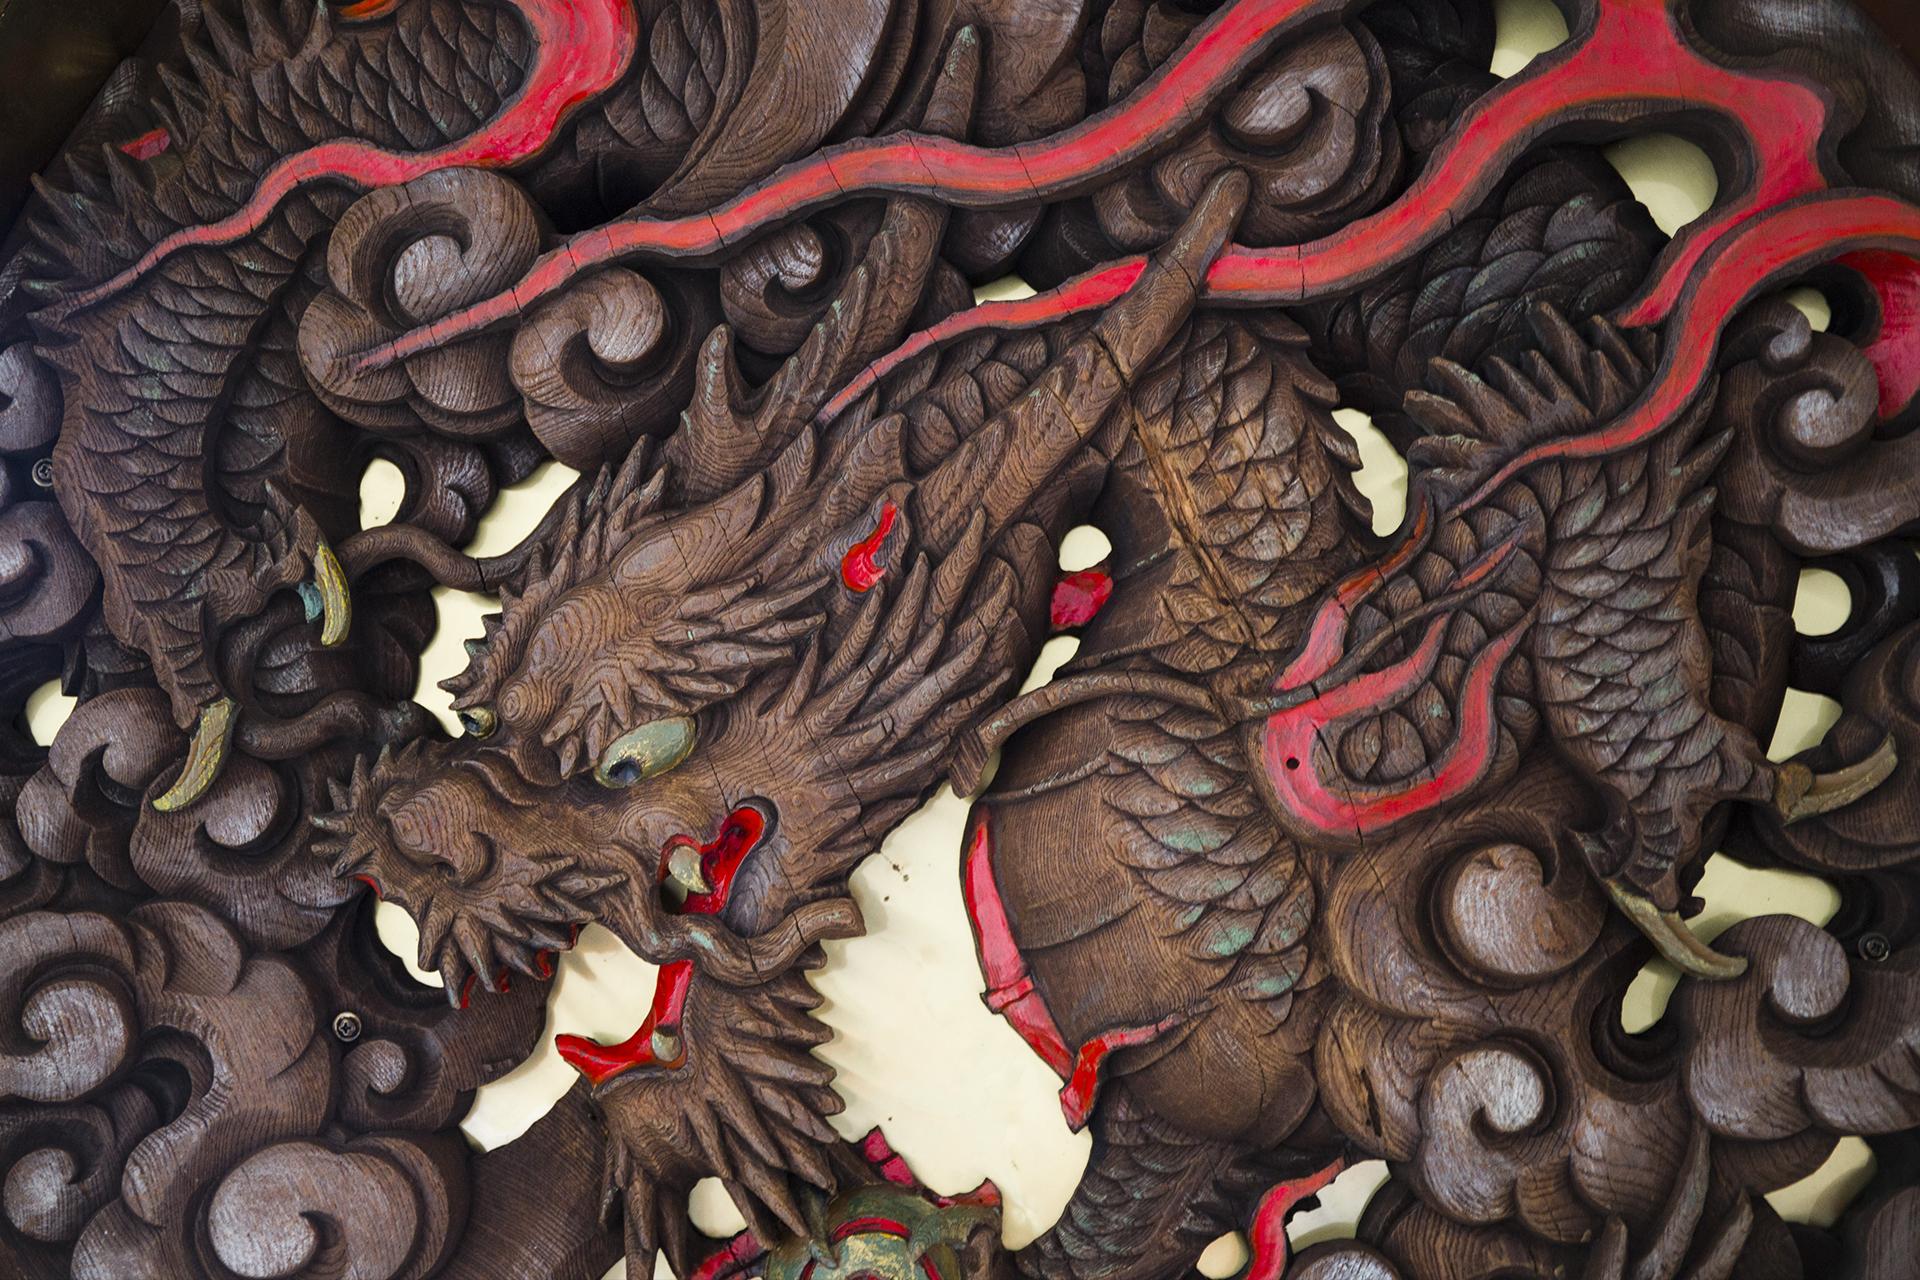 Asakusa Sensoji Temple dragon